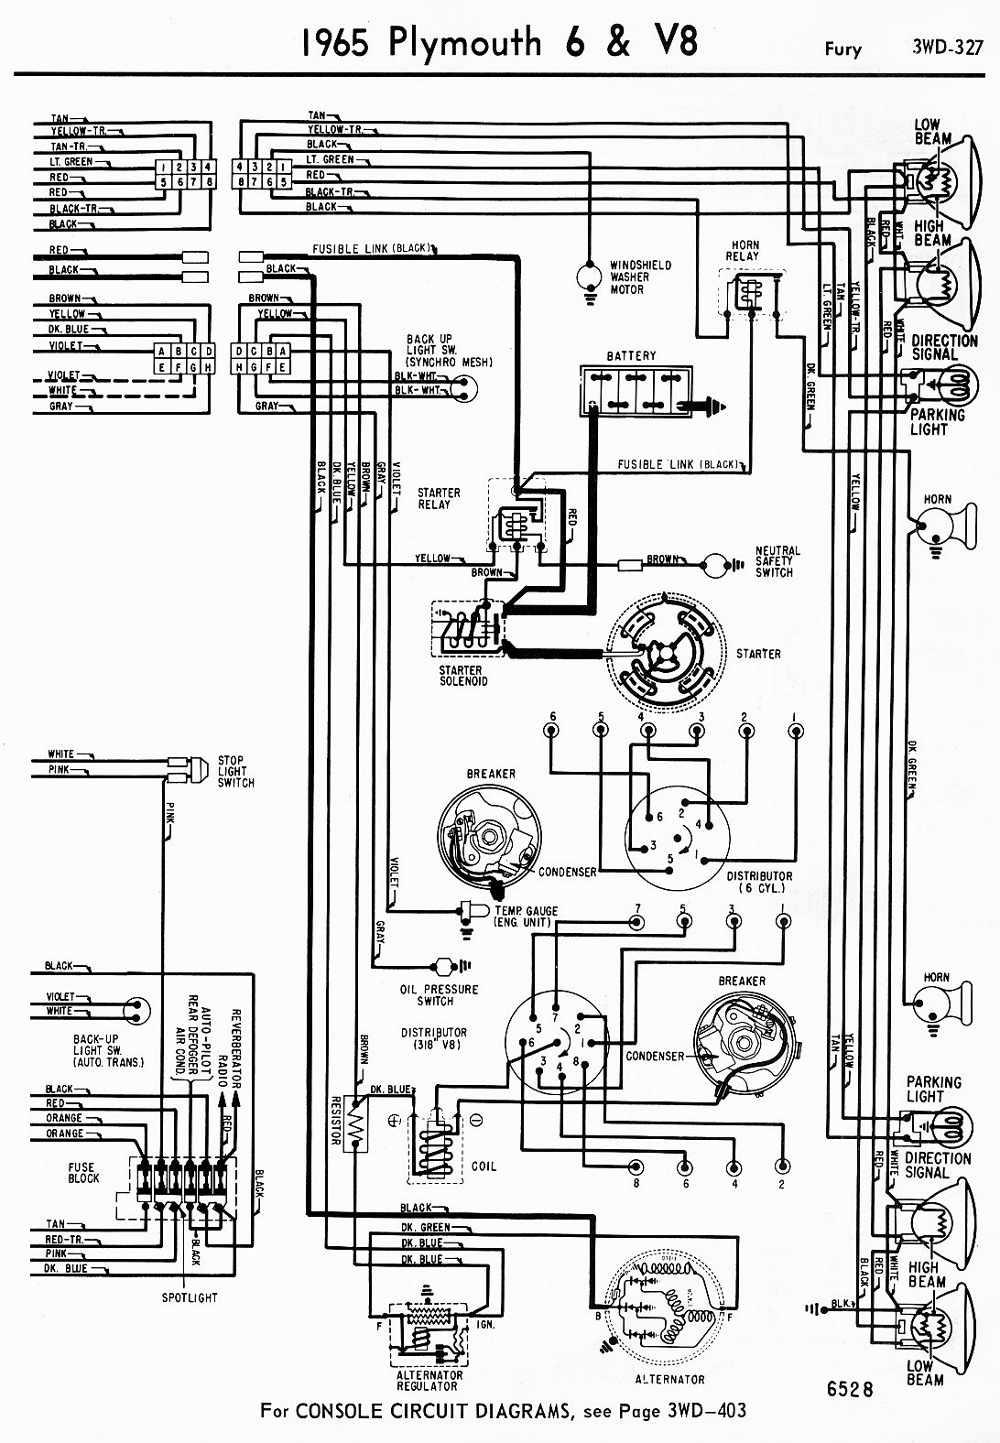 medium resolution of 1973 ford maverick fuse box 1973 chevrolet camaro fuse box 1970 plymouth barracuda 1964 plymouth barracuda